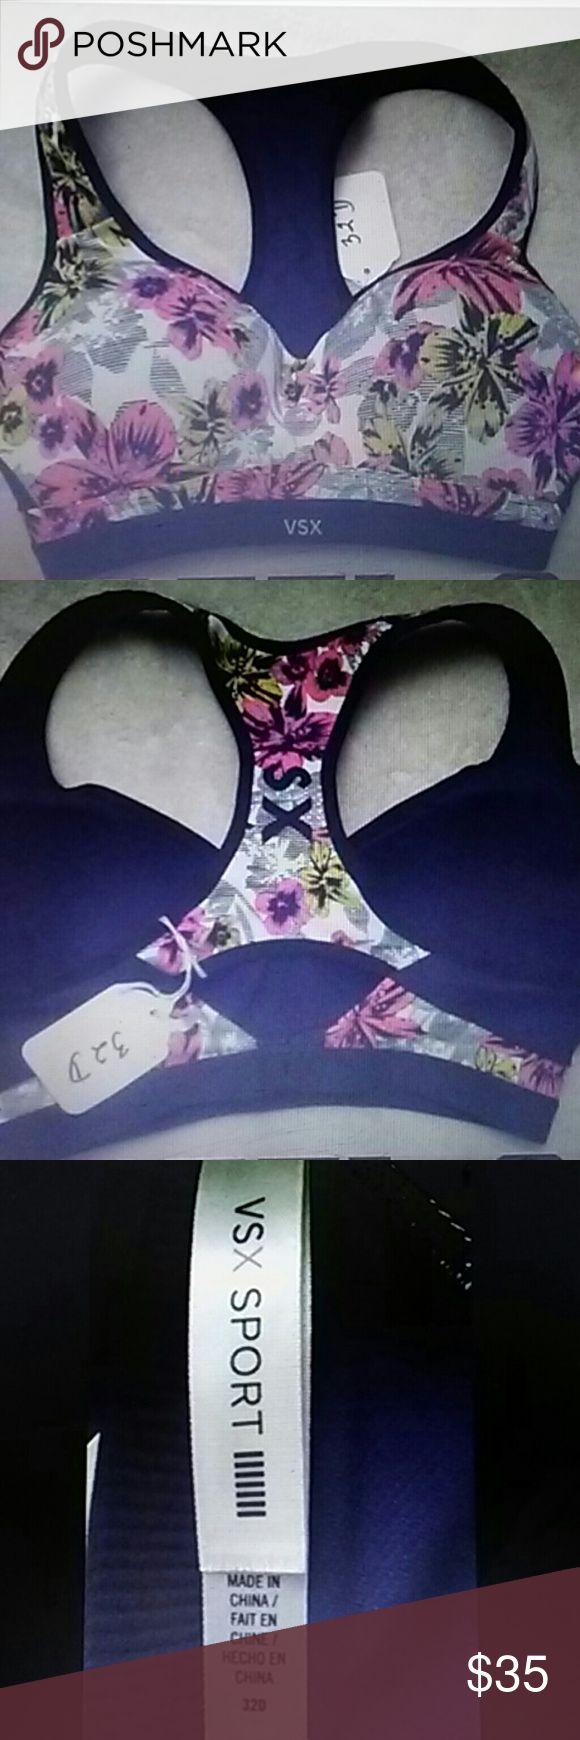 Victoria`s secret VSX sexy floral sport bra sz 32D 32d Vsx sports bra Victorias secret Nwot Victoria's Secret Intimates & Sleepwear Bras